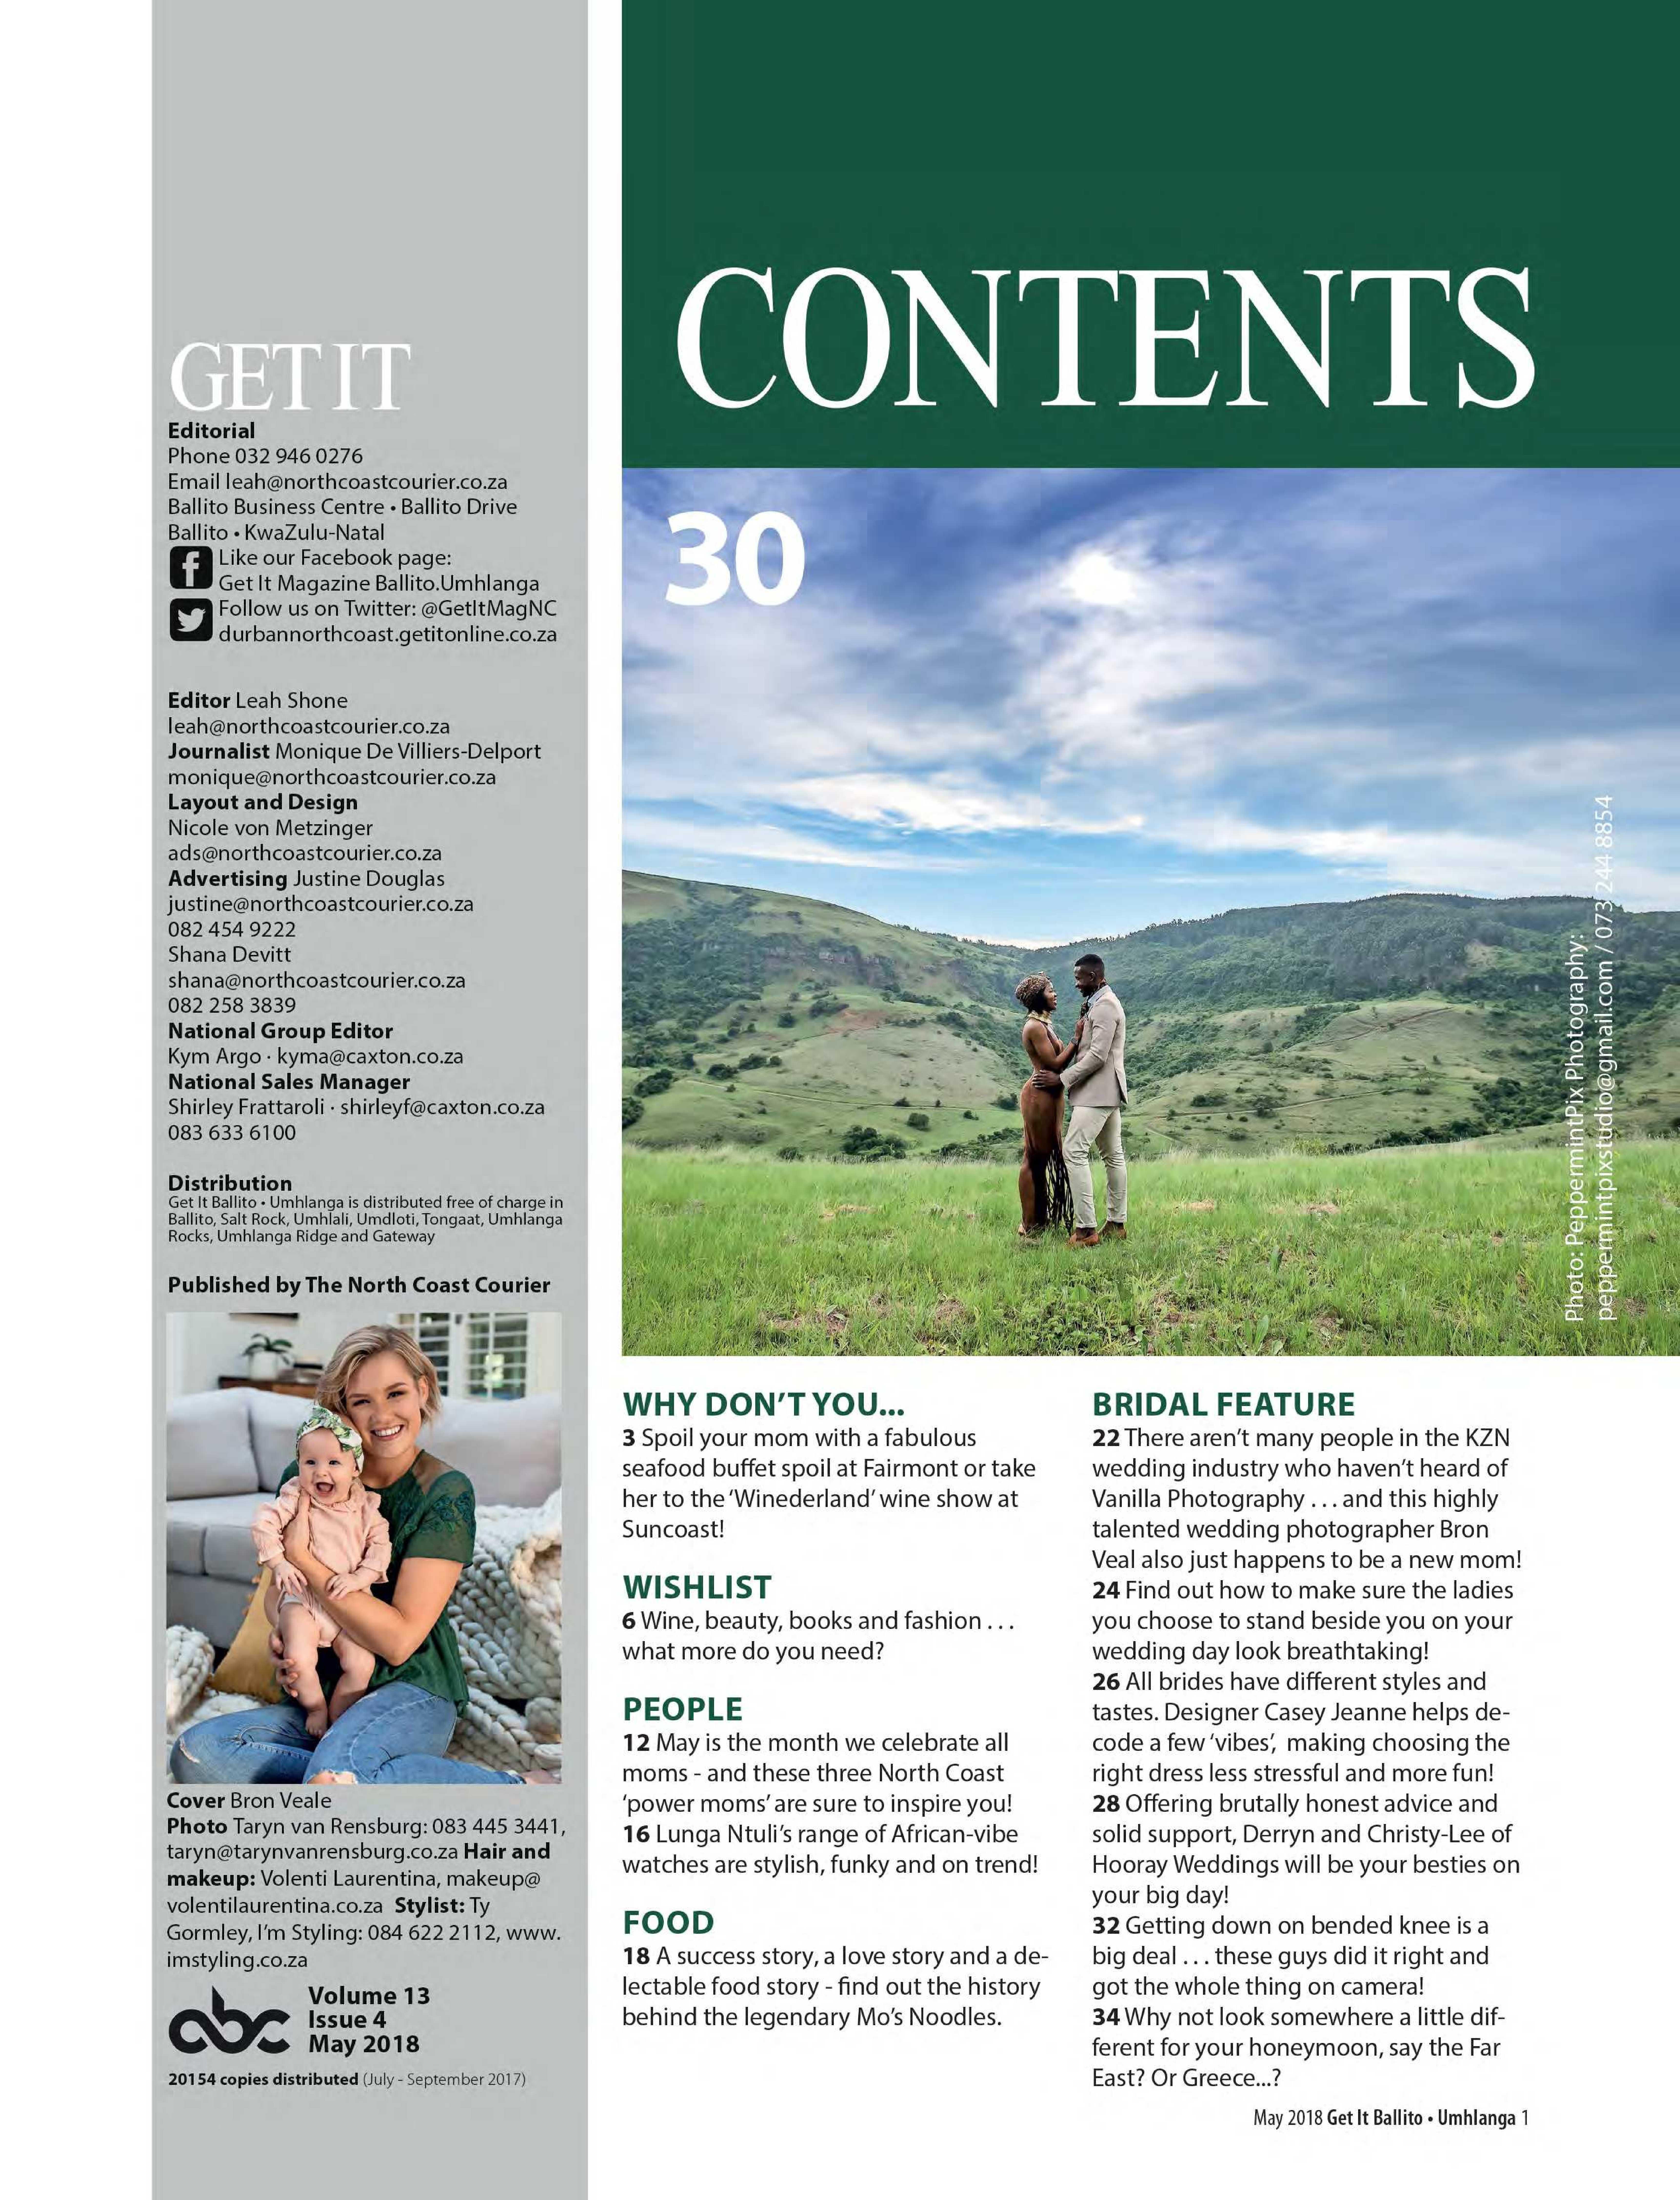 get-magazine-ballitoumhlanga-may-2018-epapers-page-3